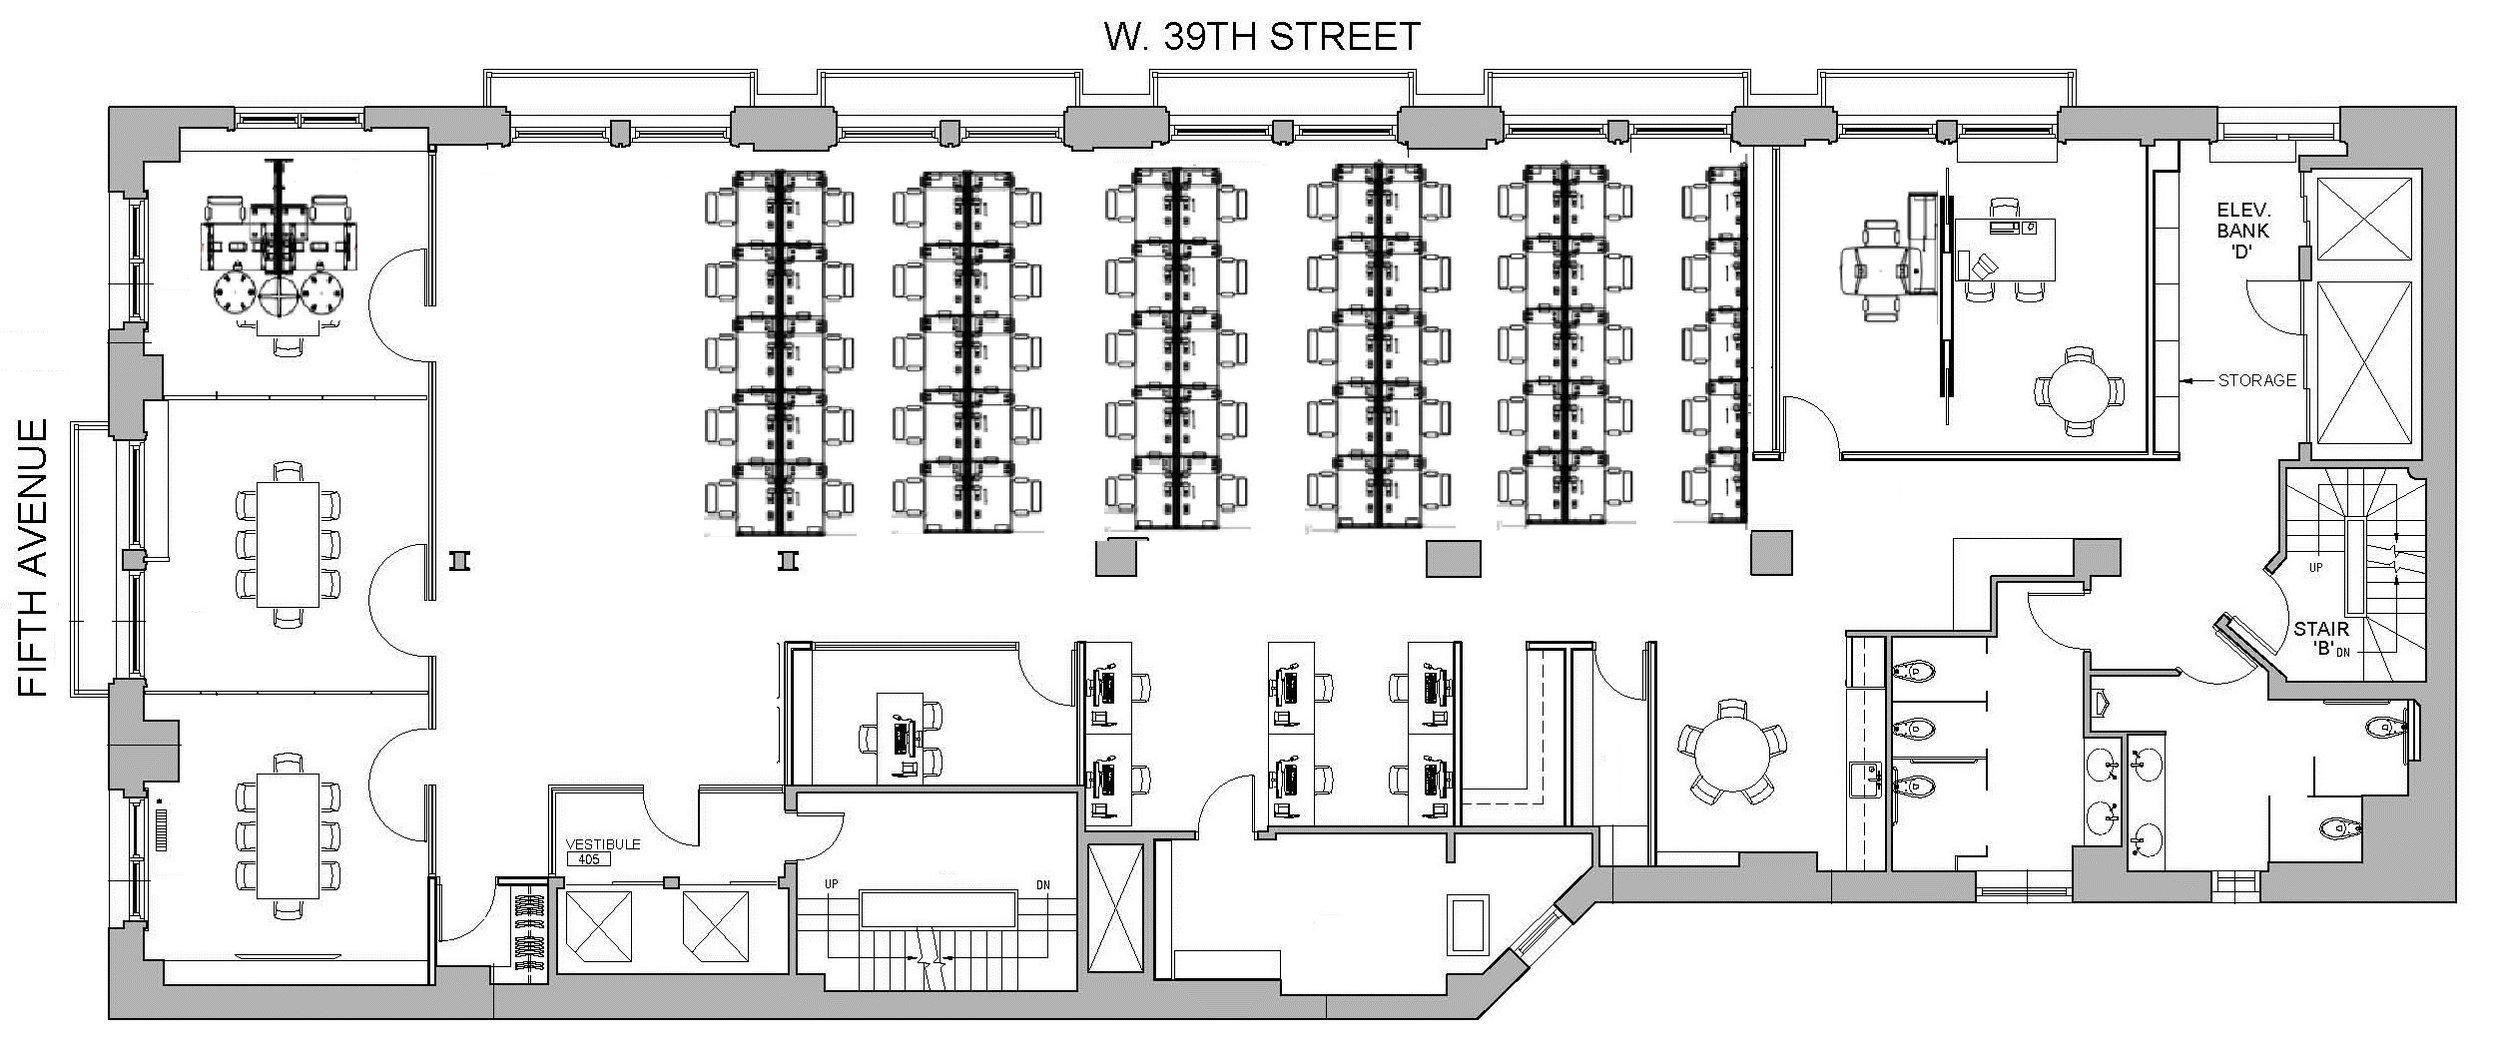 437 5th Ave - 21 Grams layout.jpg